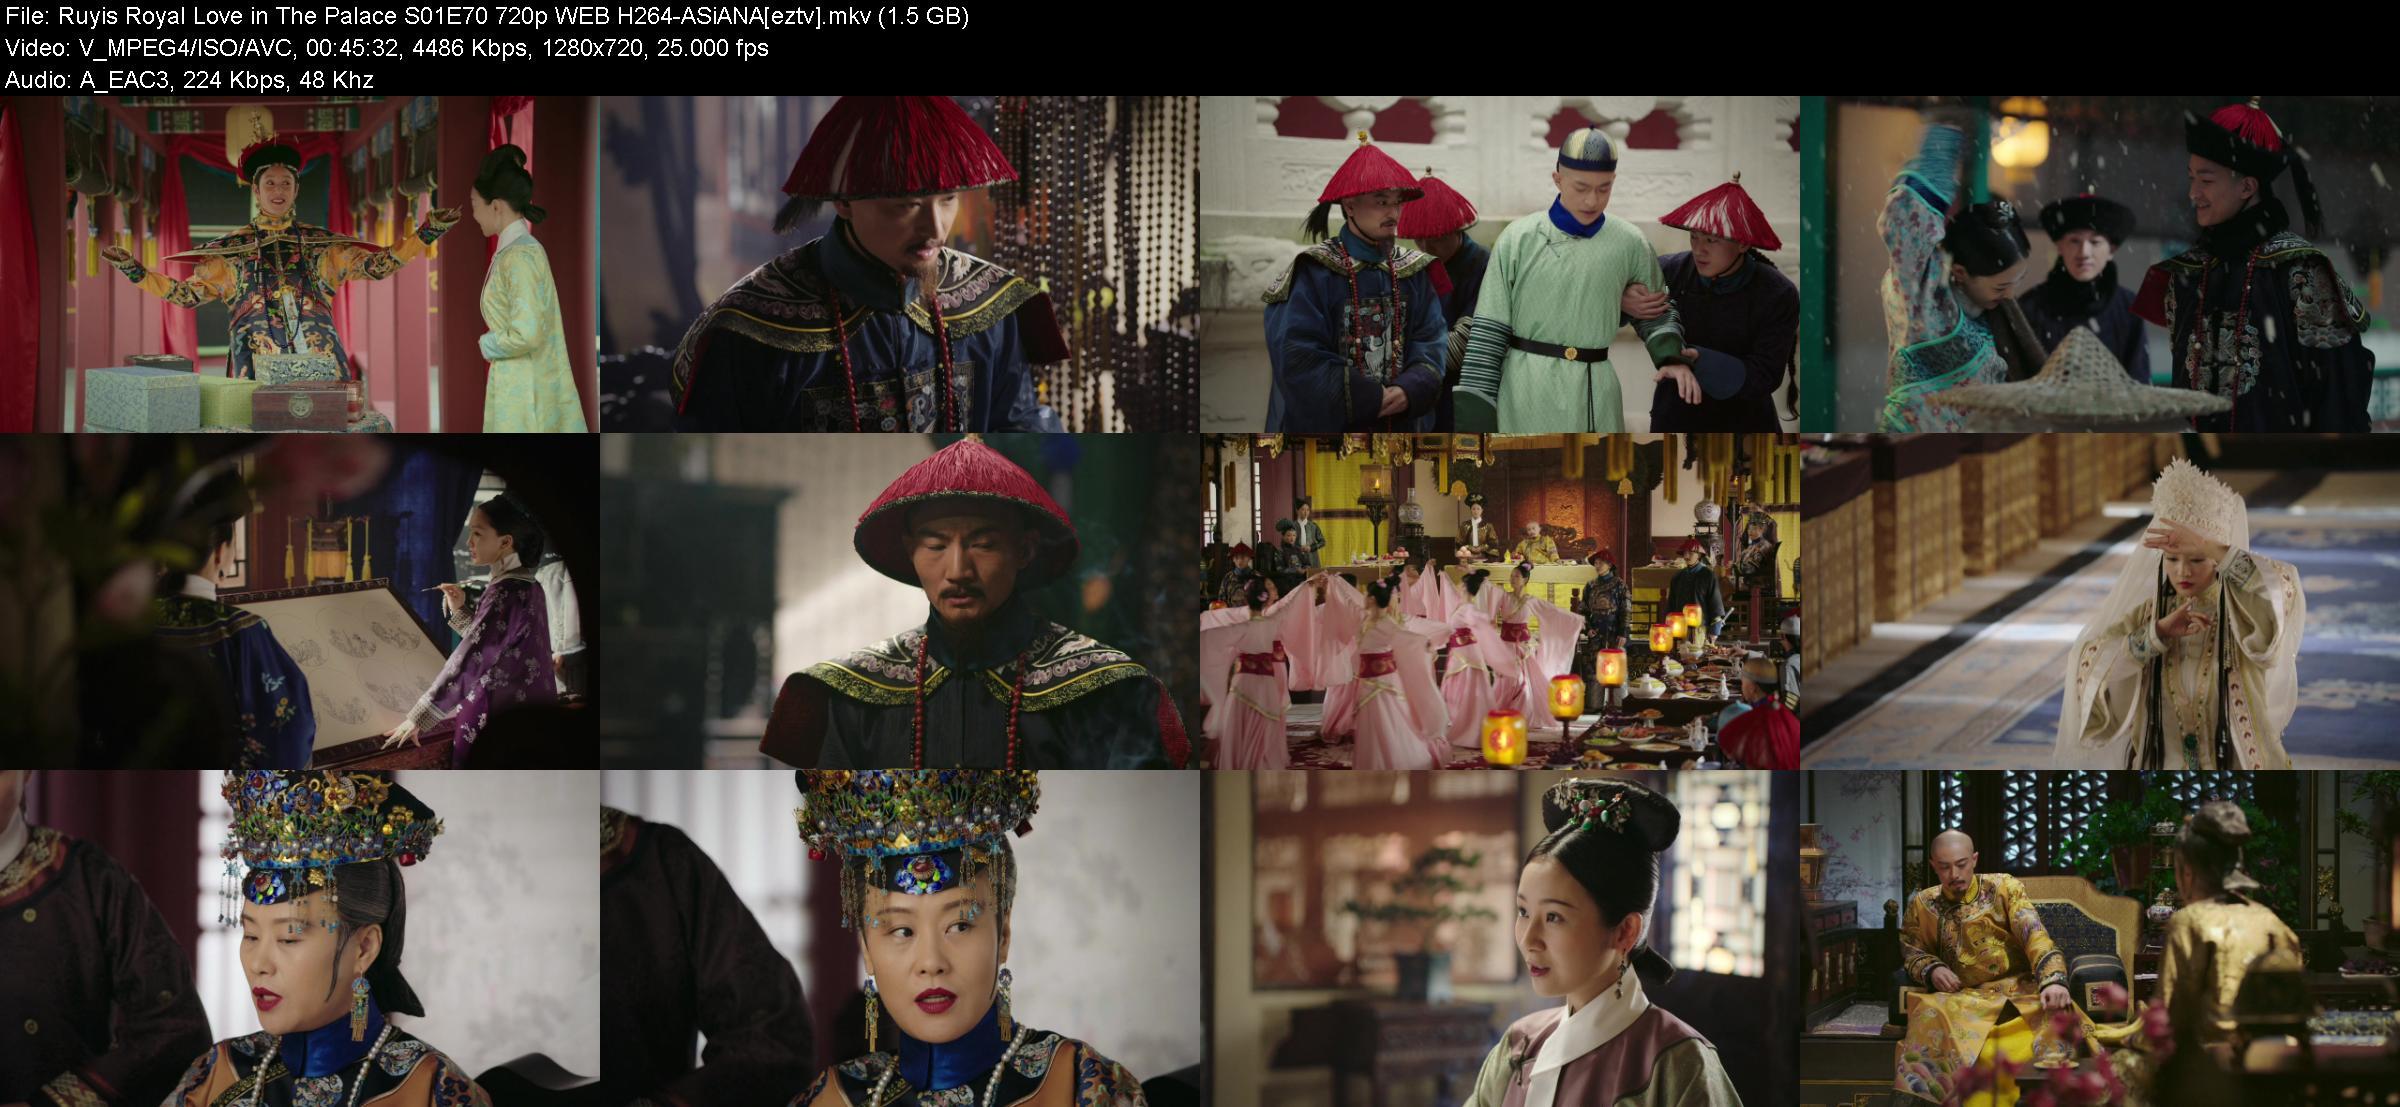 Ruyis Royal Love in The Palace S01E70 720p WEB H264-ASiANA